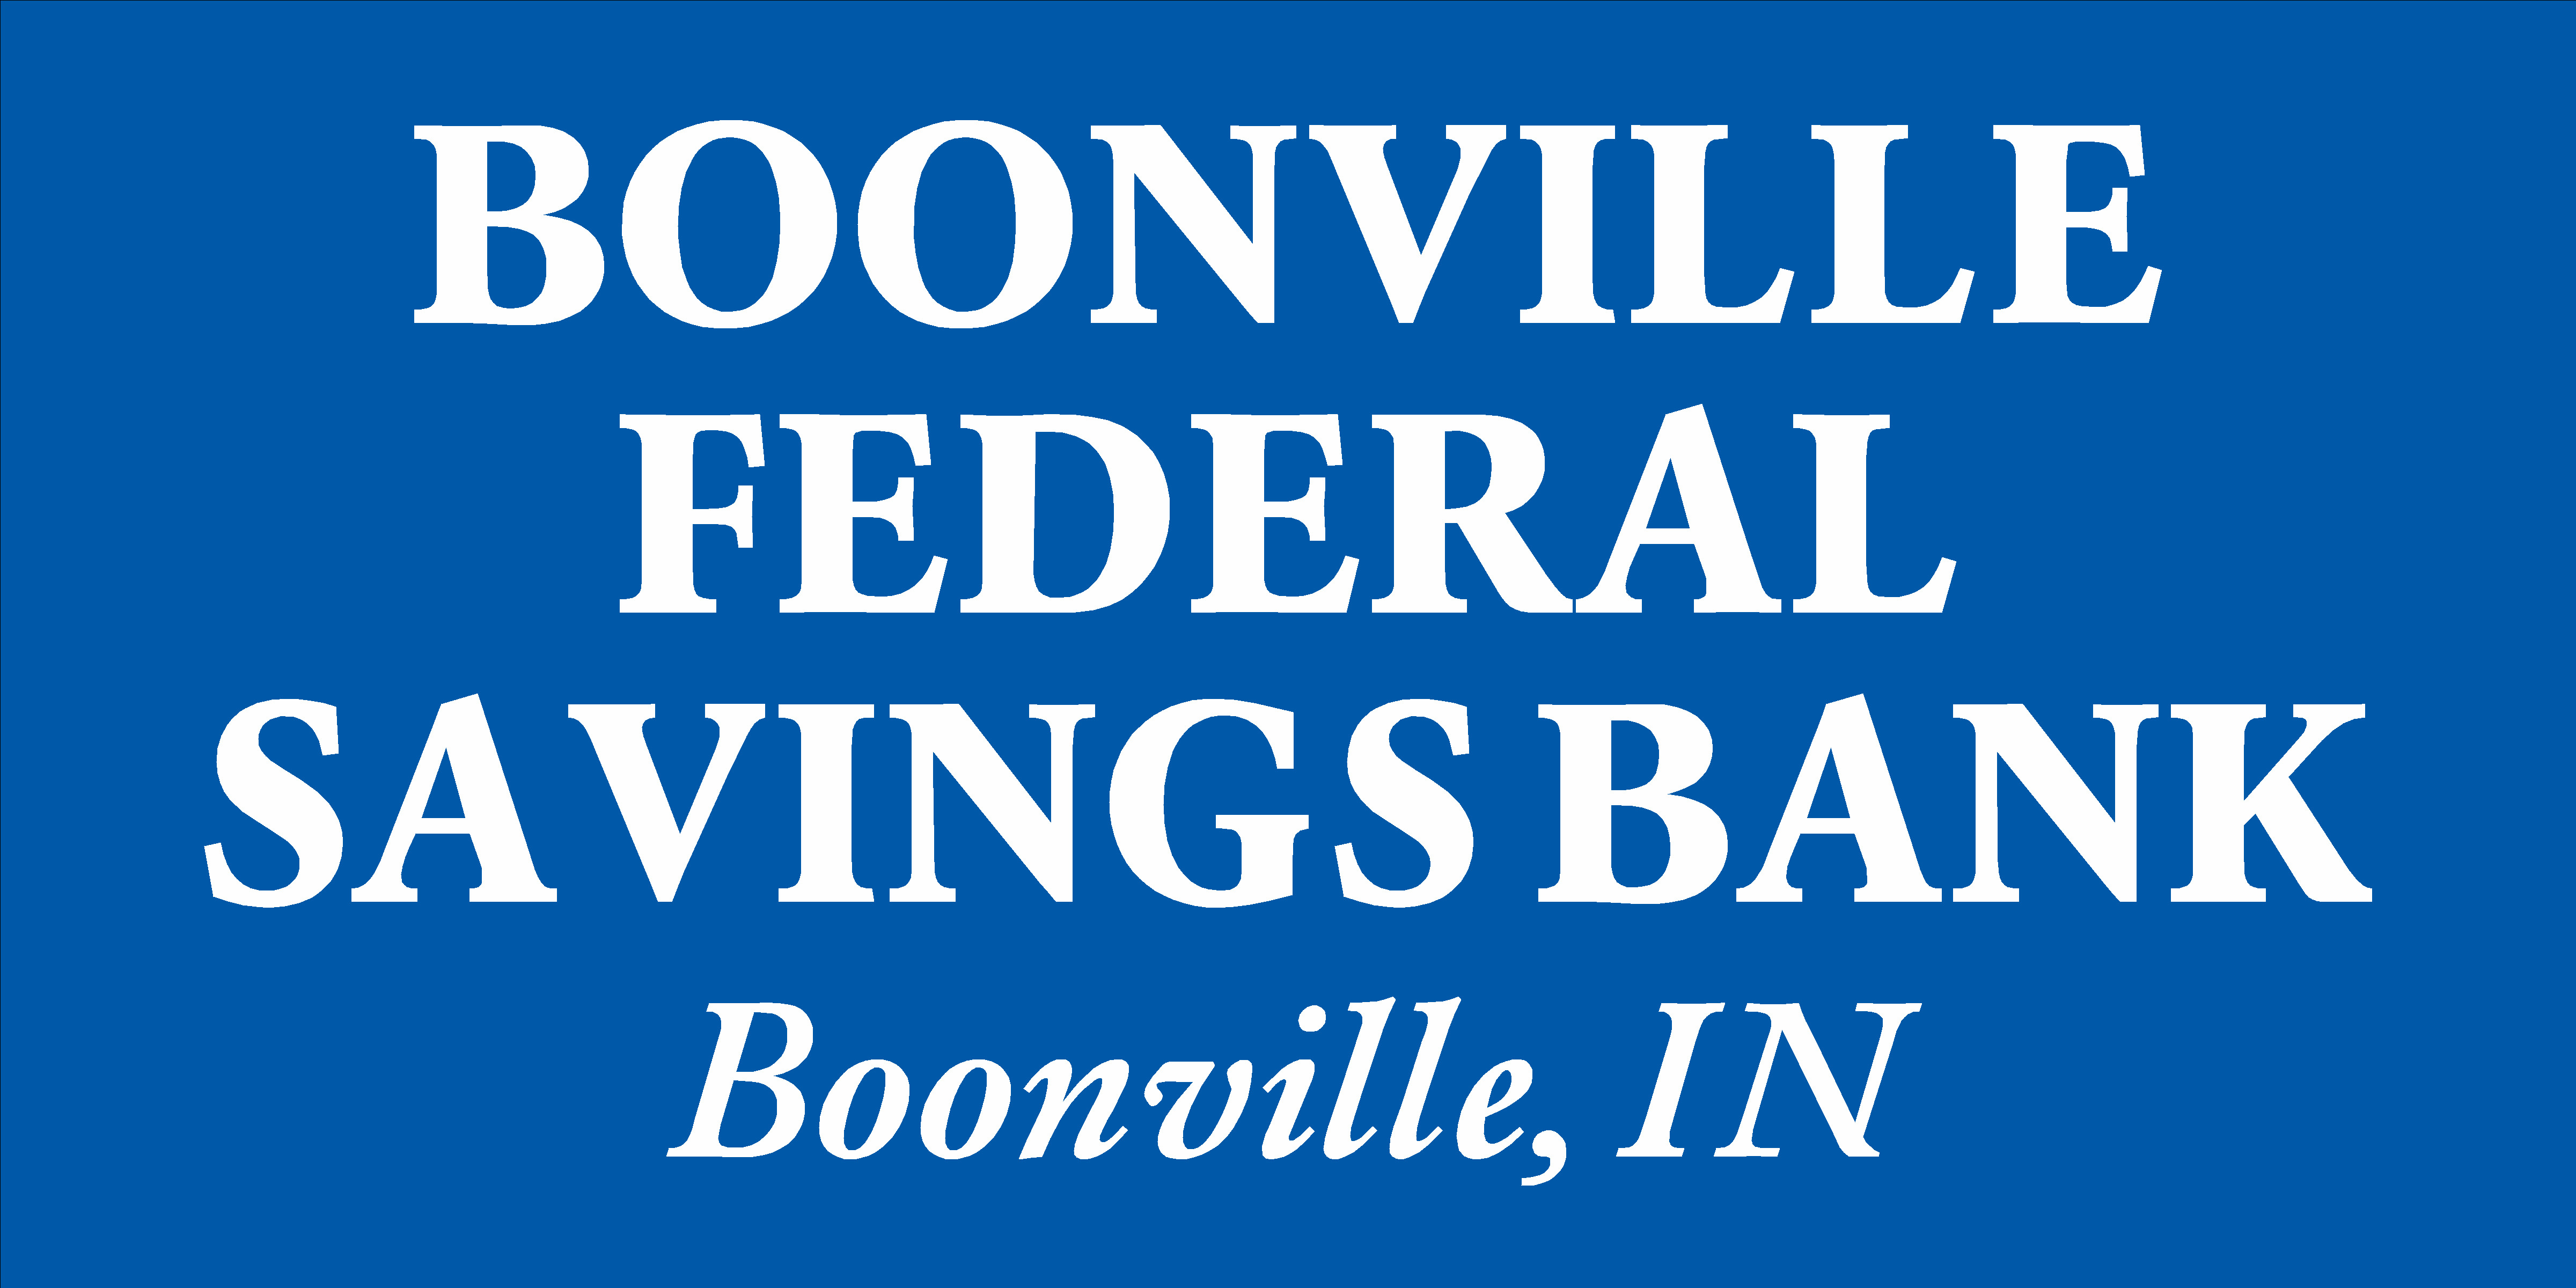 Boonville Federal Savings